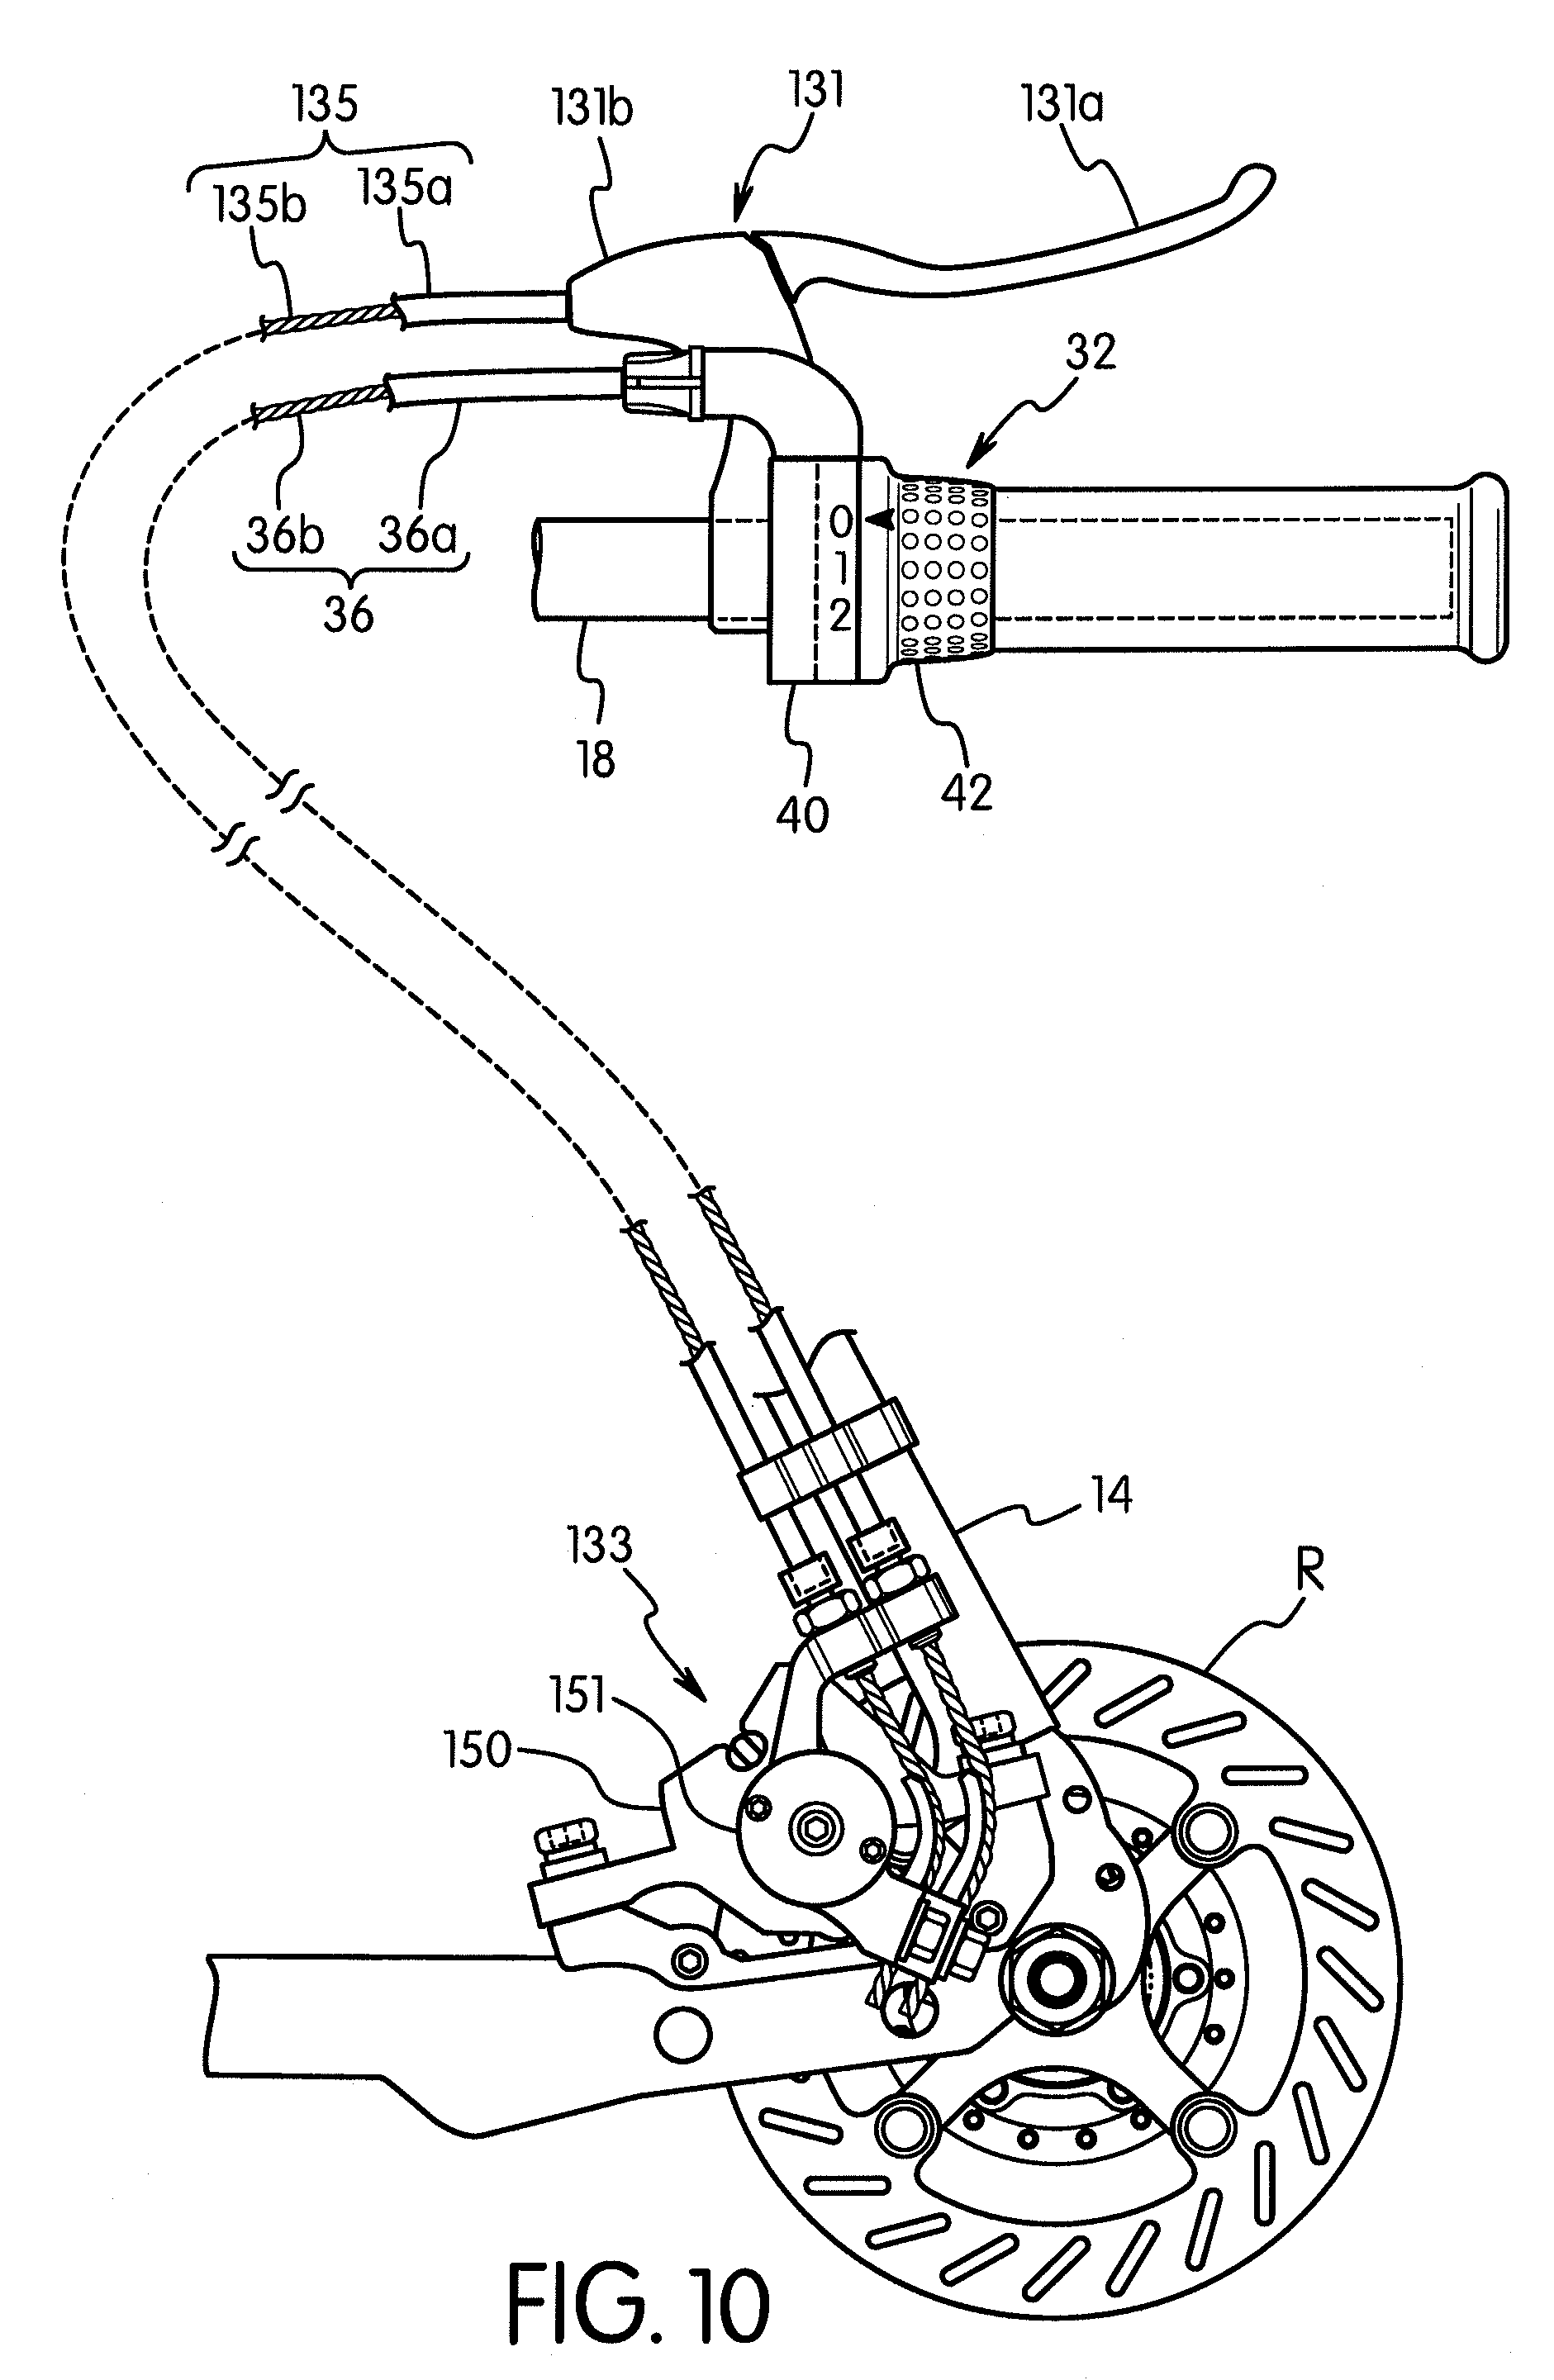 Bicycle Brake Systems : Patent us bicycle braking system google patents